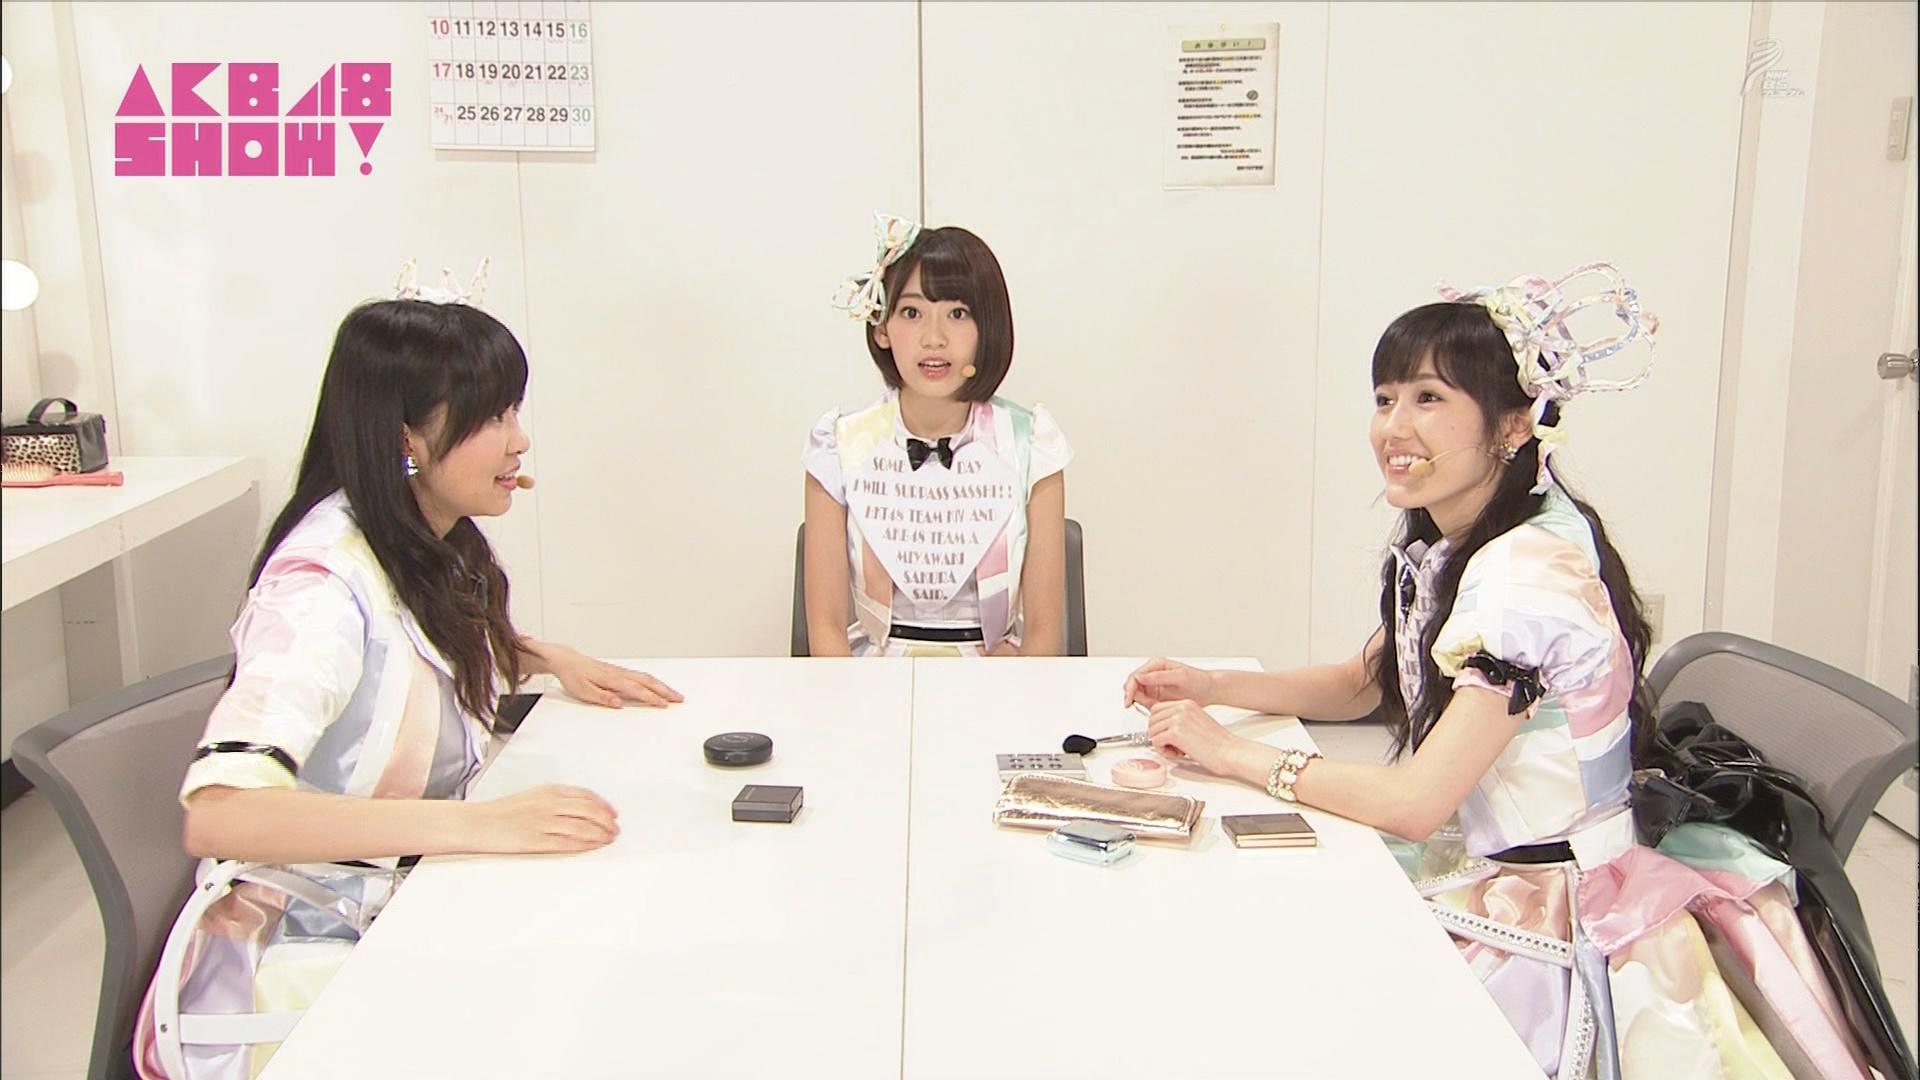 AKB48SHOW 心のプラカード 宮脇咲良 20140830 (13)